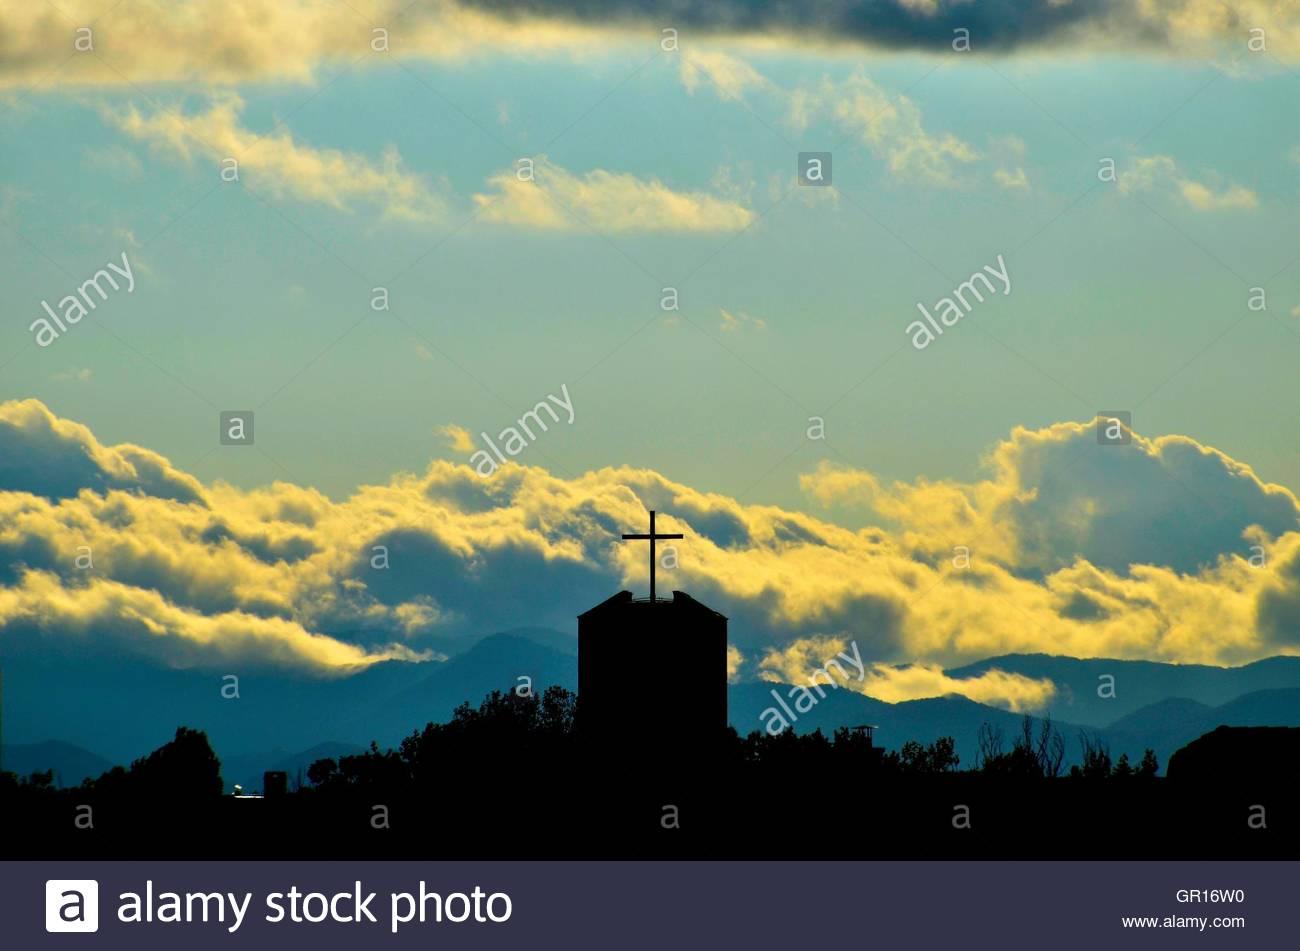 Zagreb,Croatia.05 Sep 2016. Croatia Weather: Dramatic sky over Zagreb. Credit:  Alen Gurovic/Alamy Live News - Stock Image